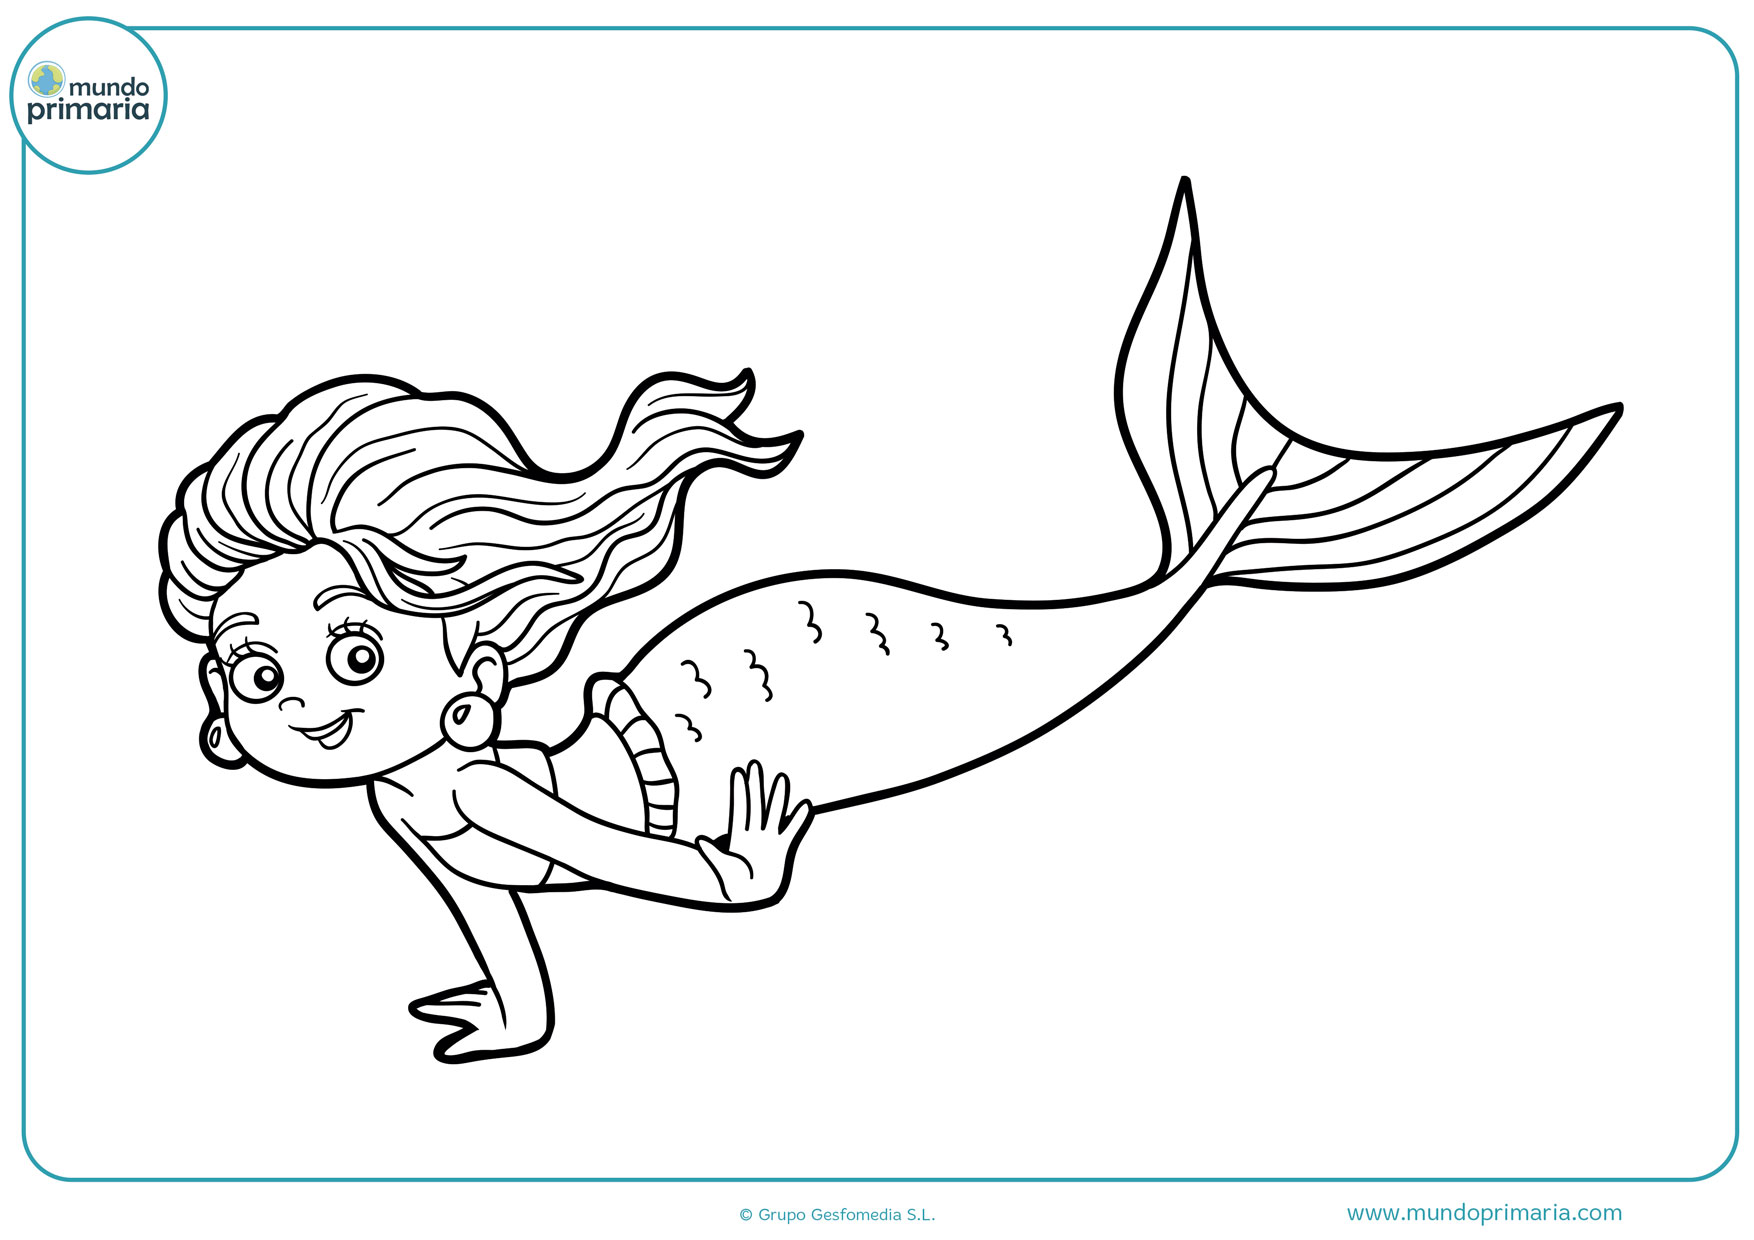 Dibujos De Sirenas Para Colorear E Imprimir Gratis